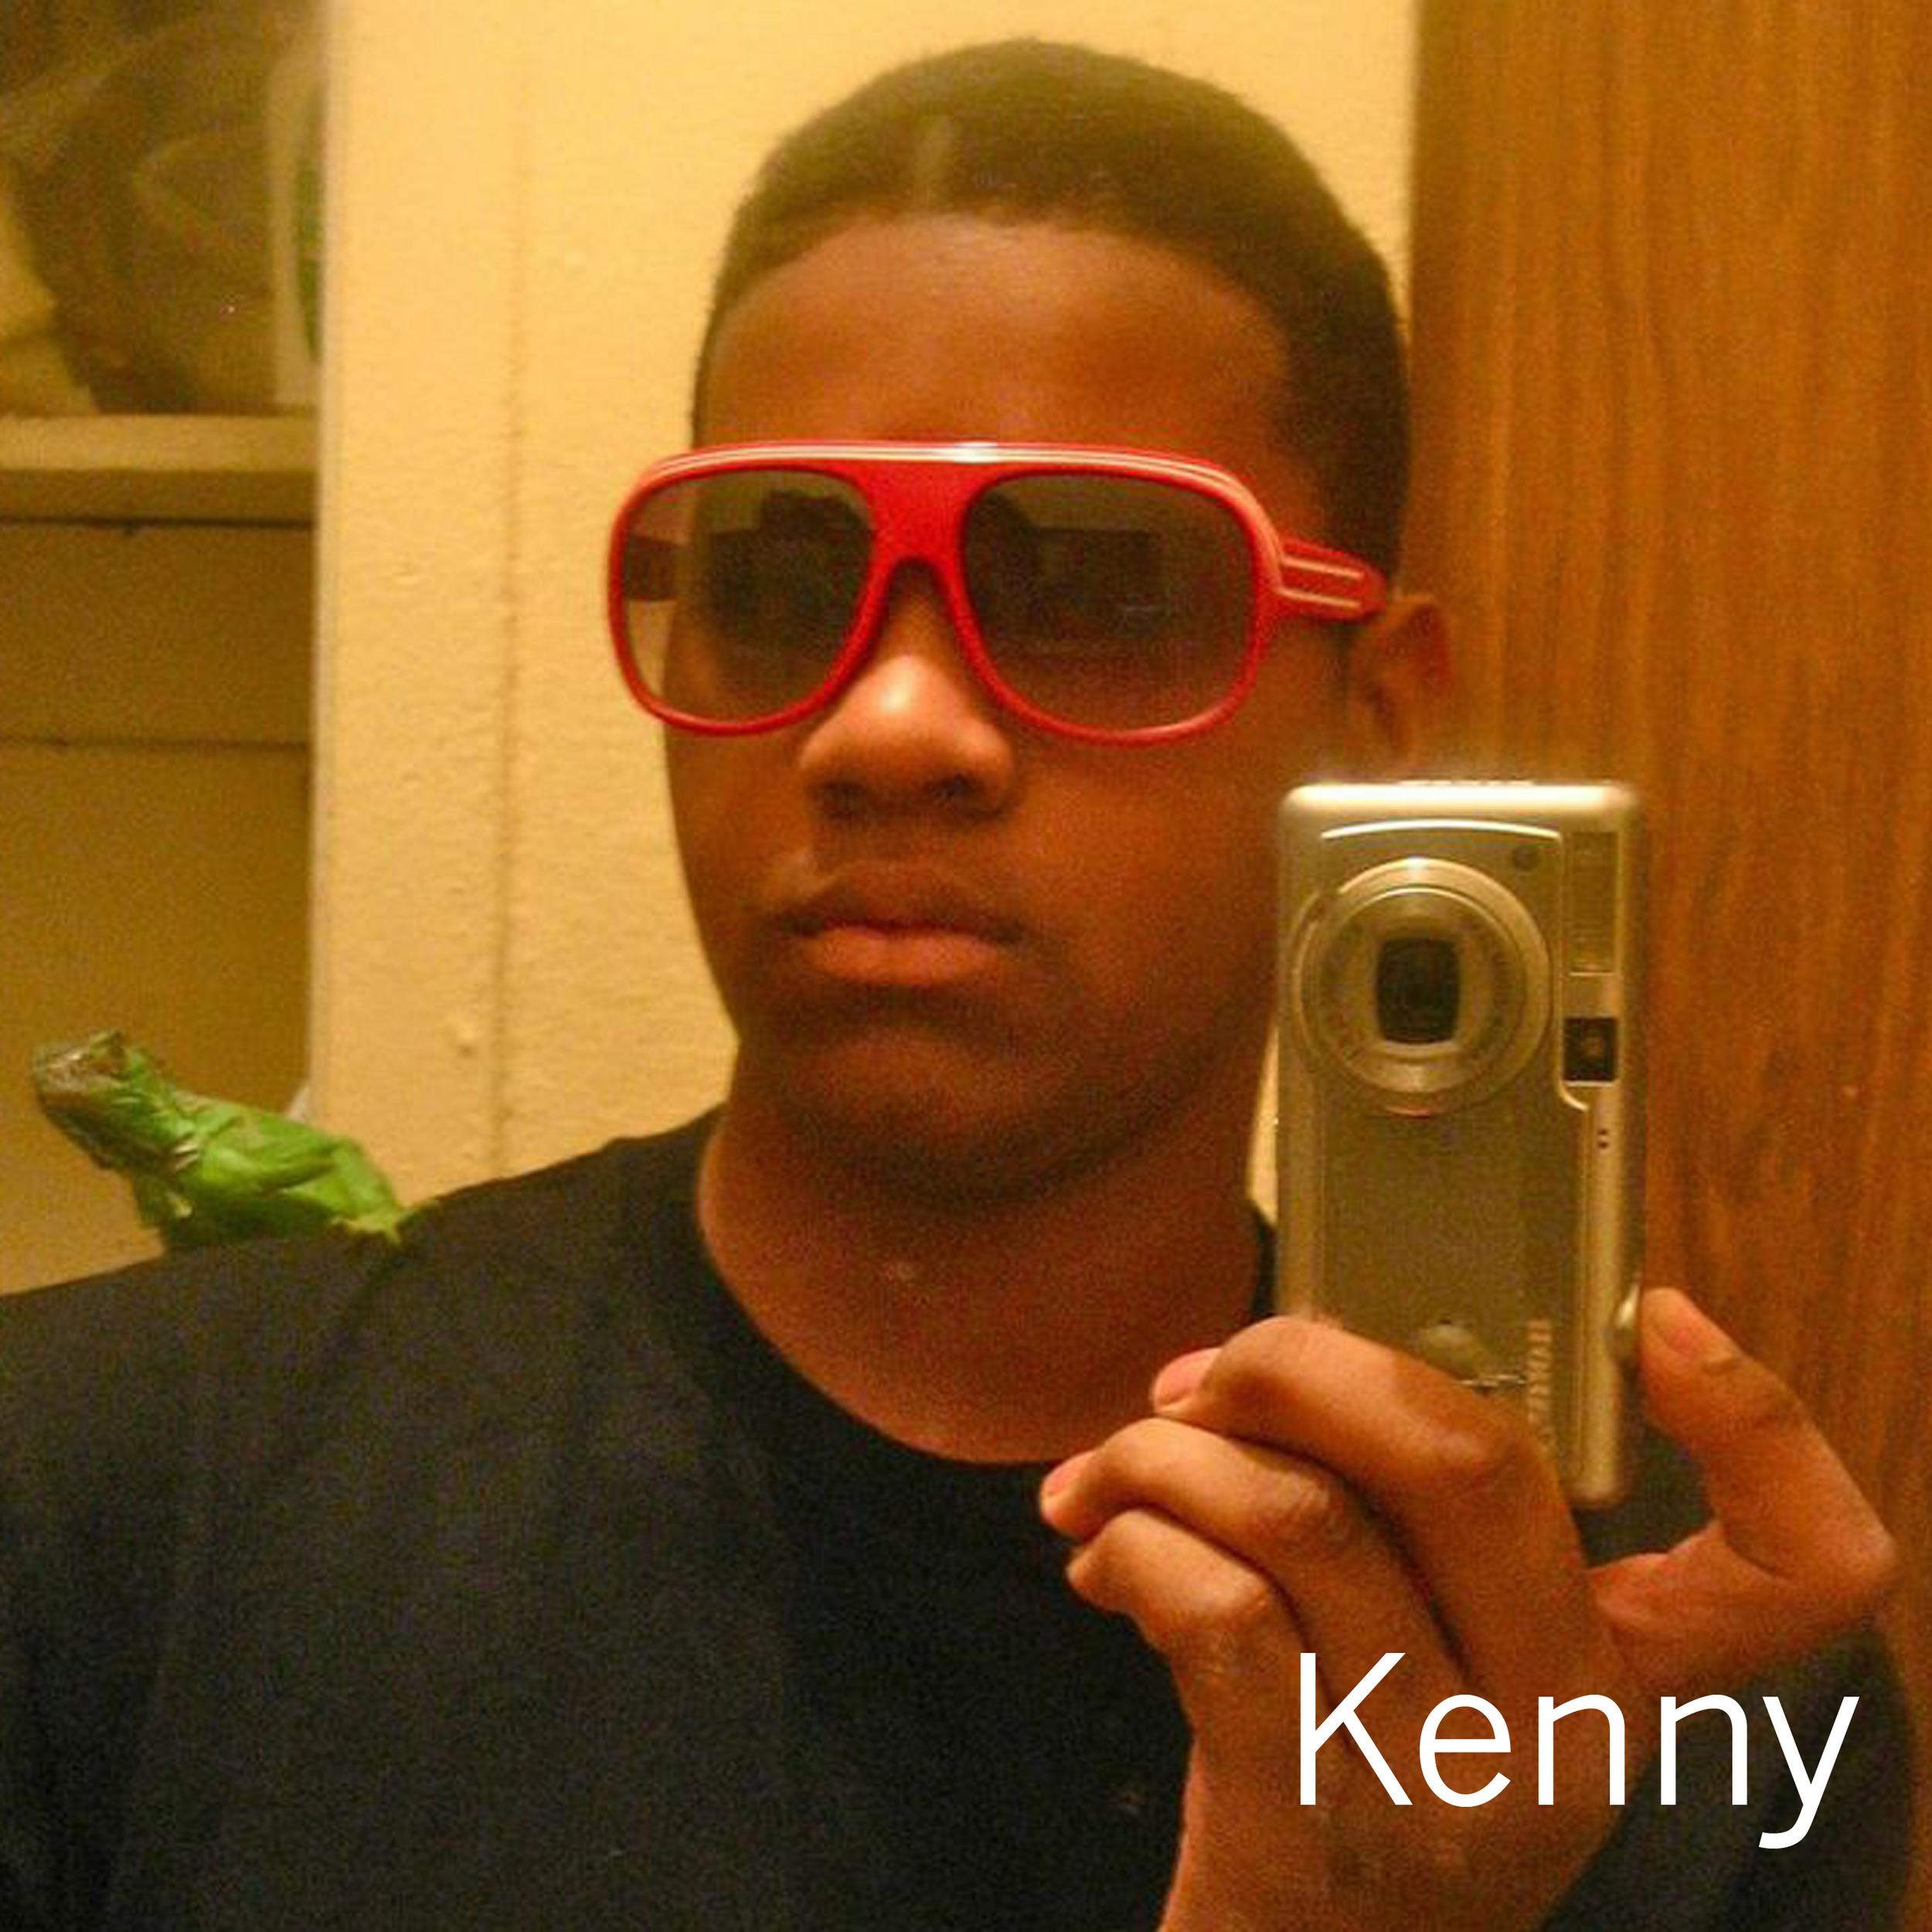 kenny002_Name.jpg